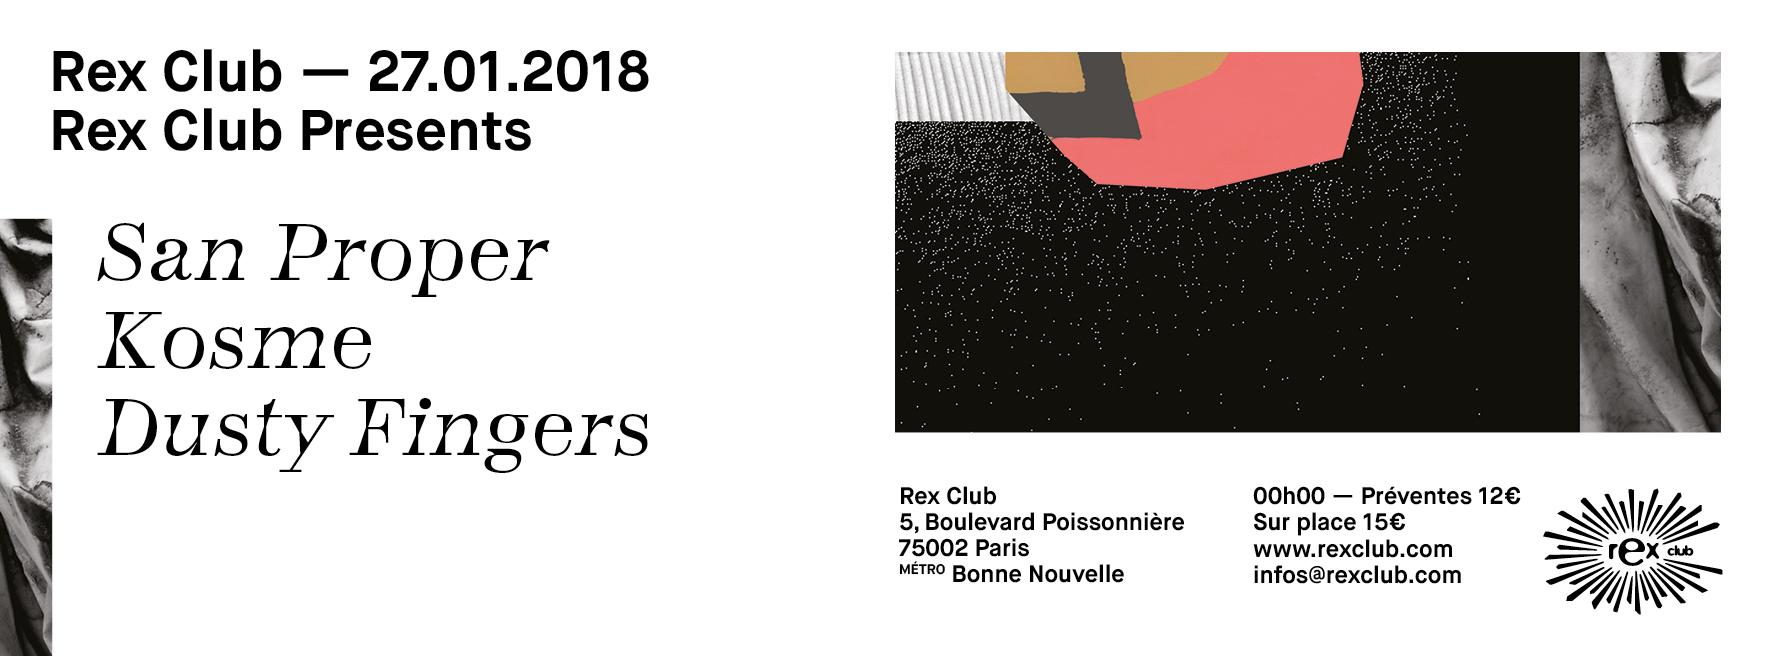 Rex Club presente: San Proper, Kosme, Dusty Fingers